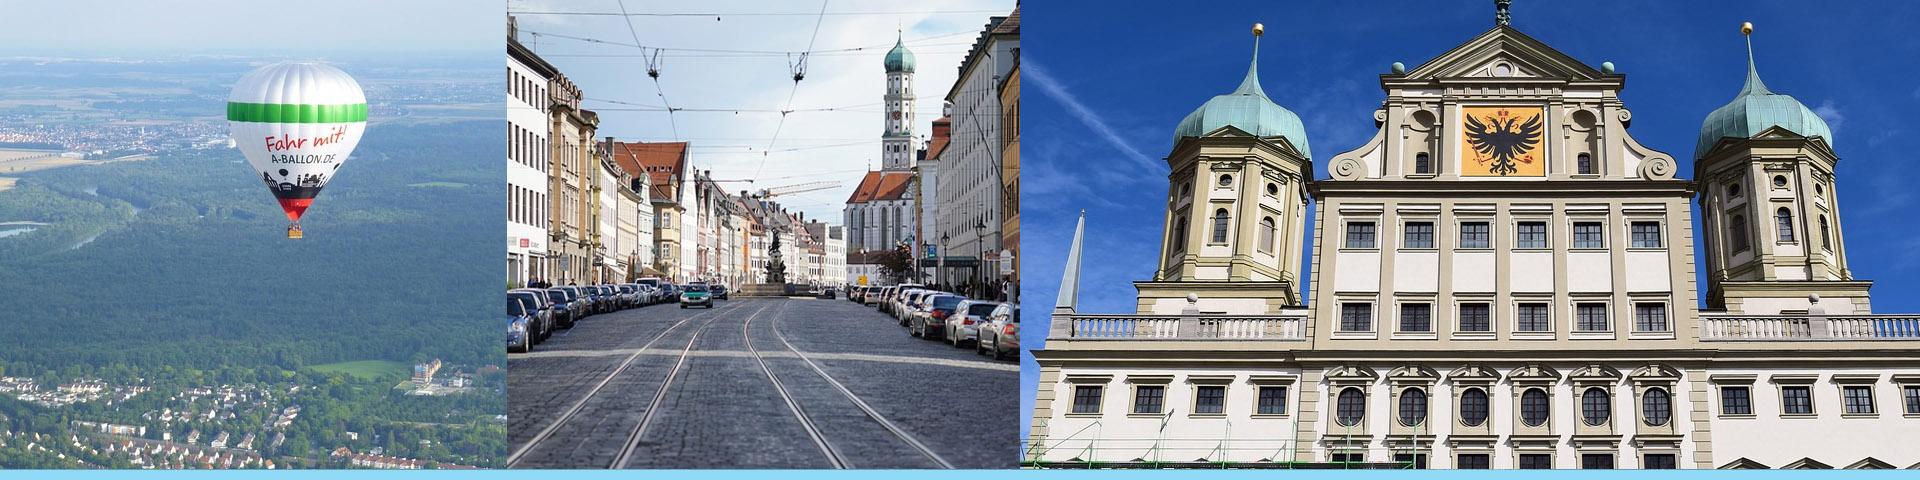 Bayern einfach anders!